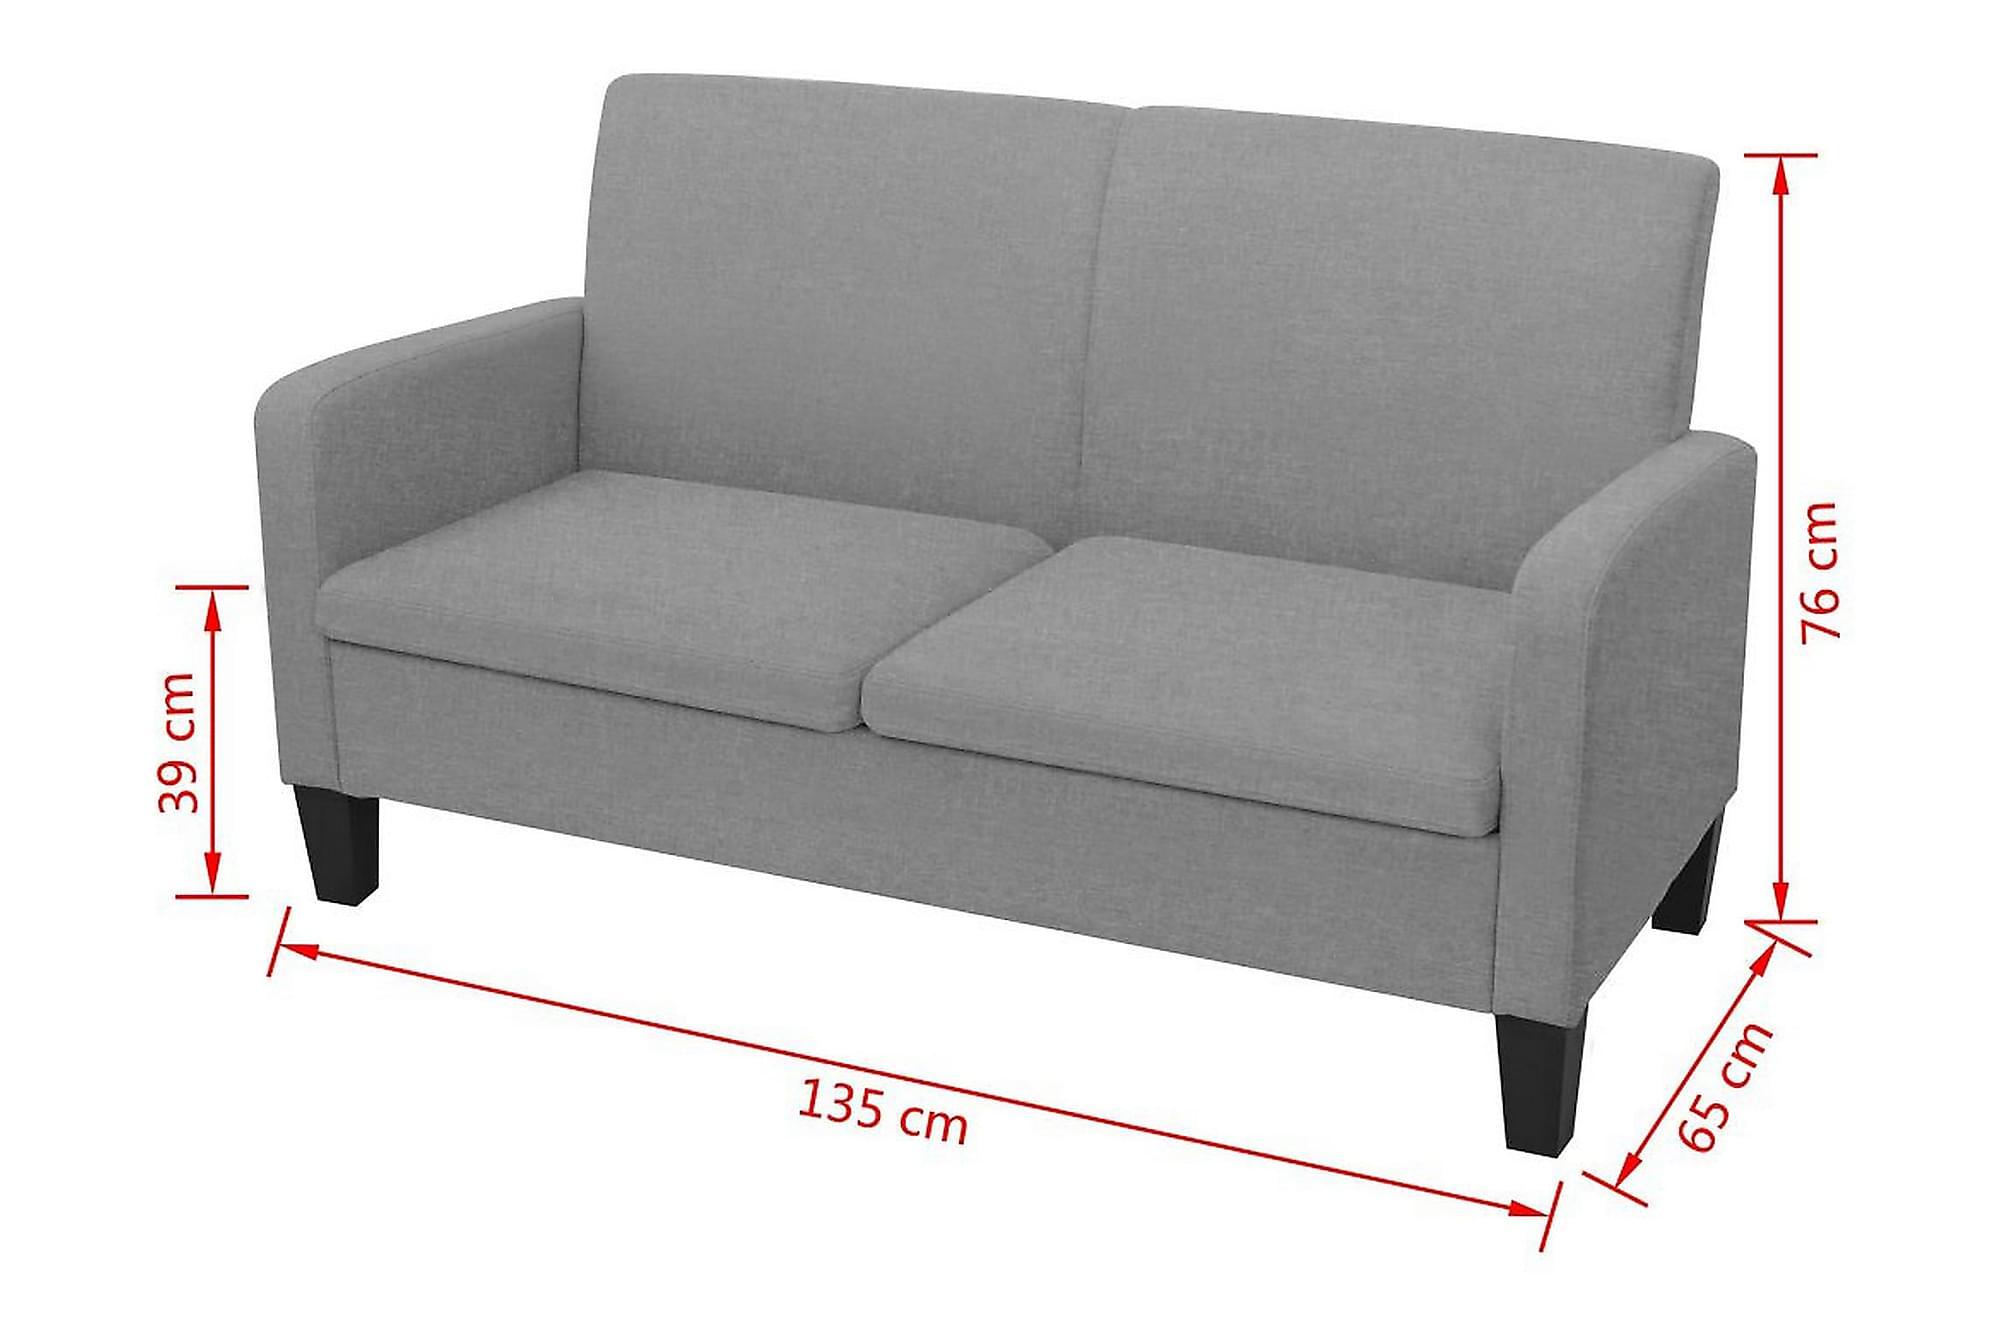 2-sitssoffa 135x65x76 cm ljusgrå, 2-sits soffor